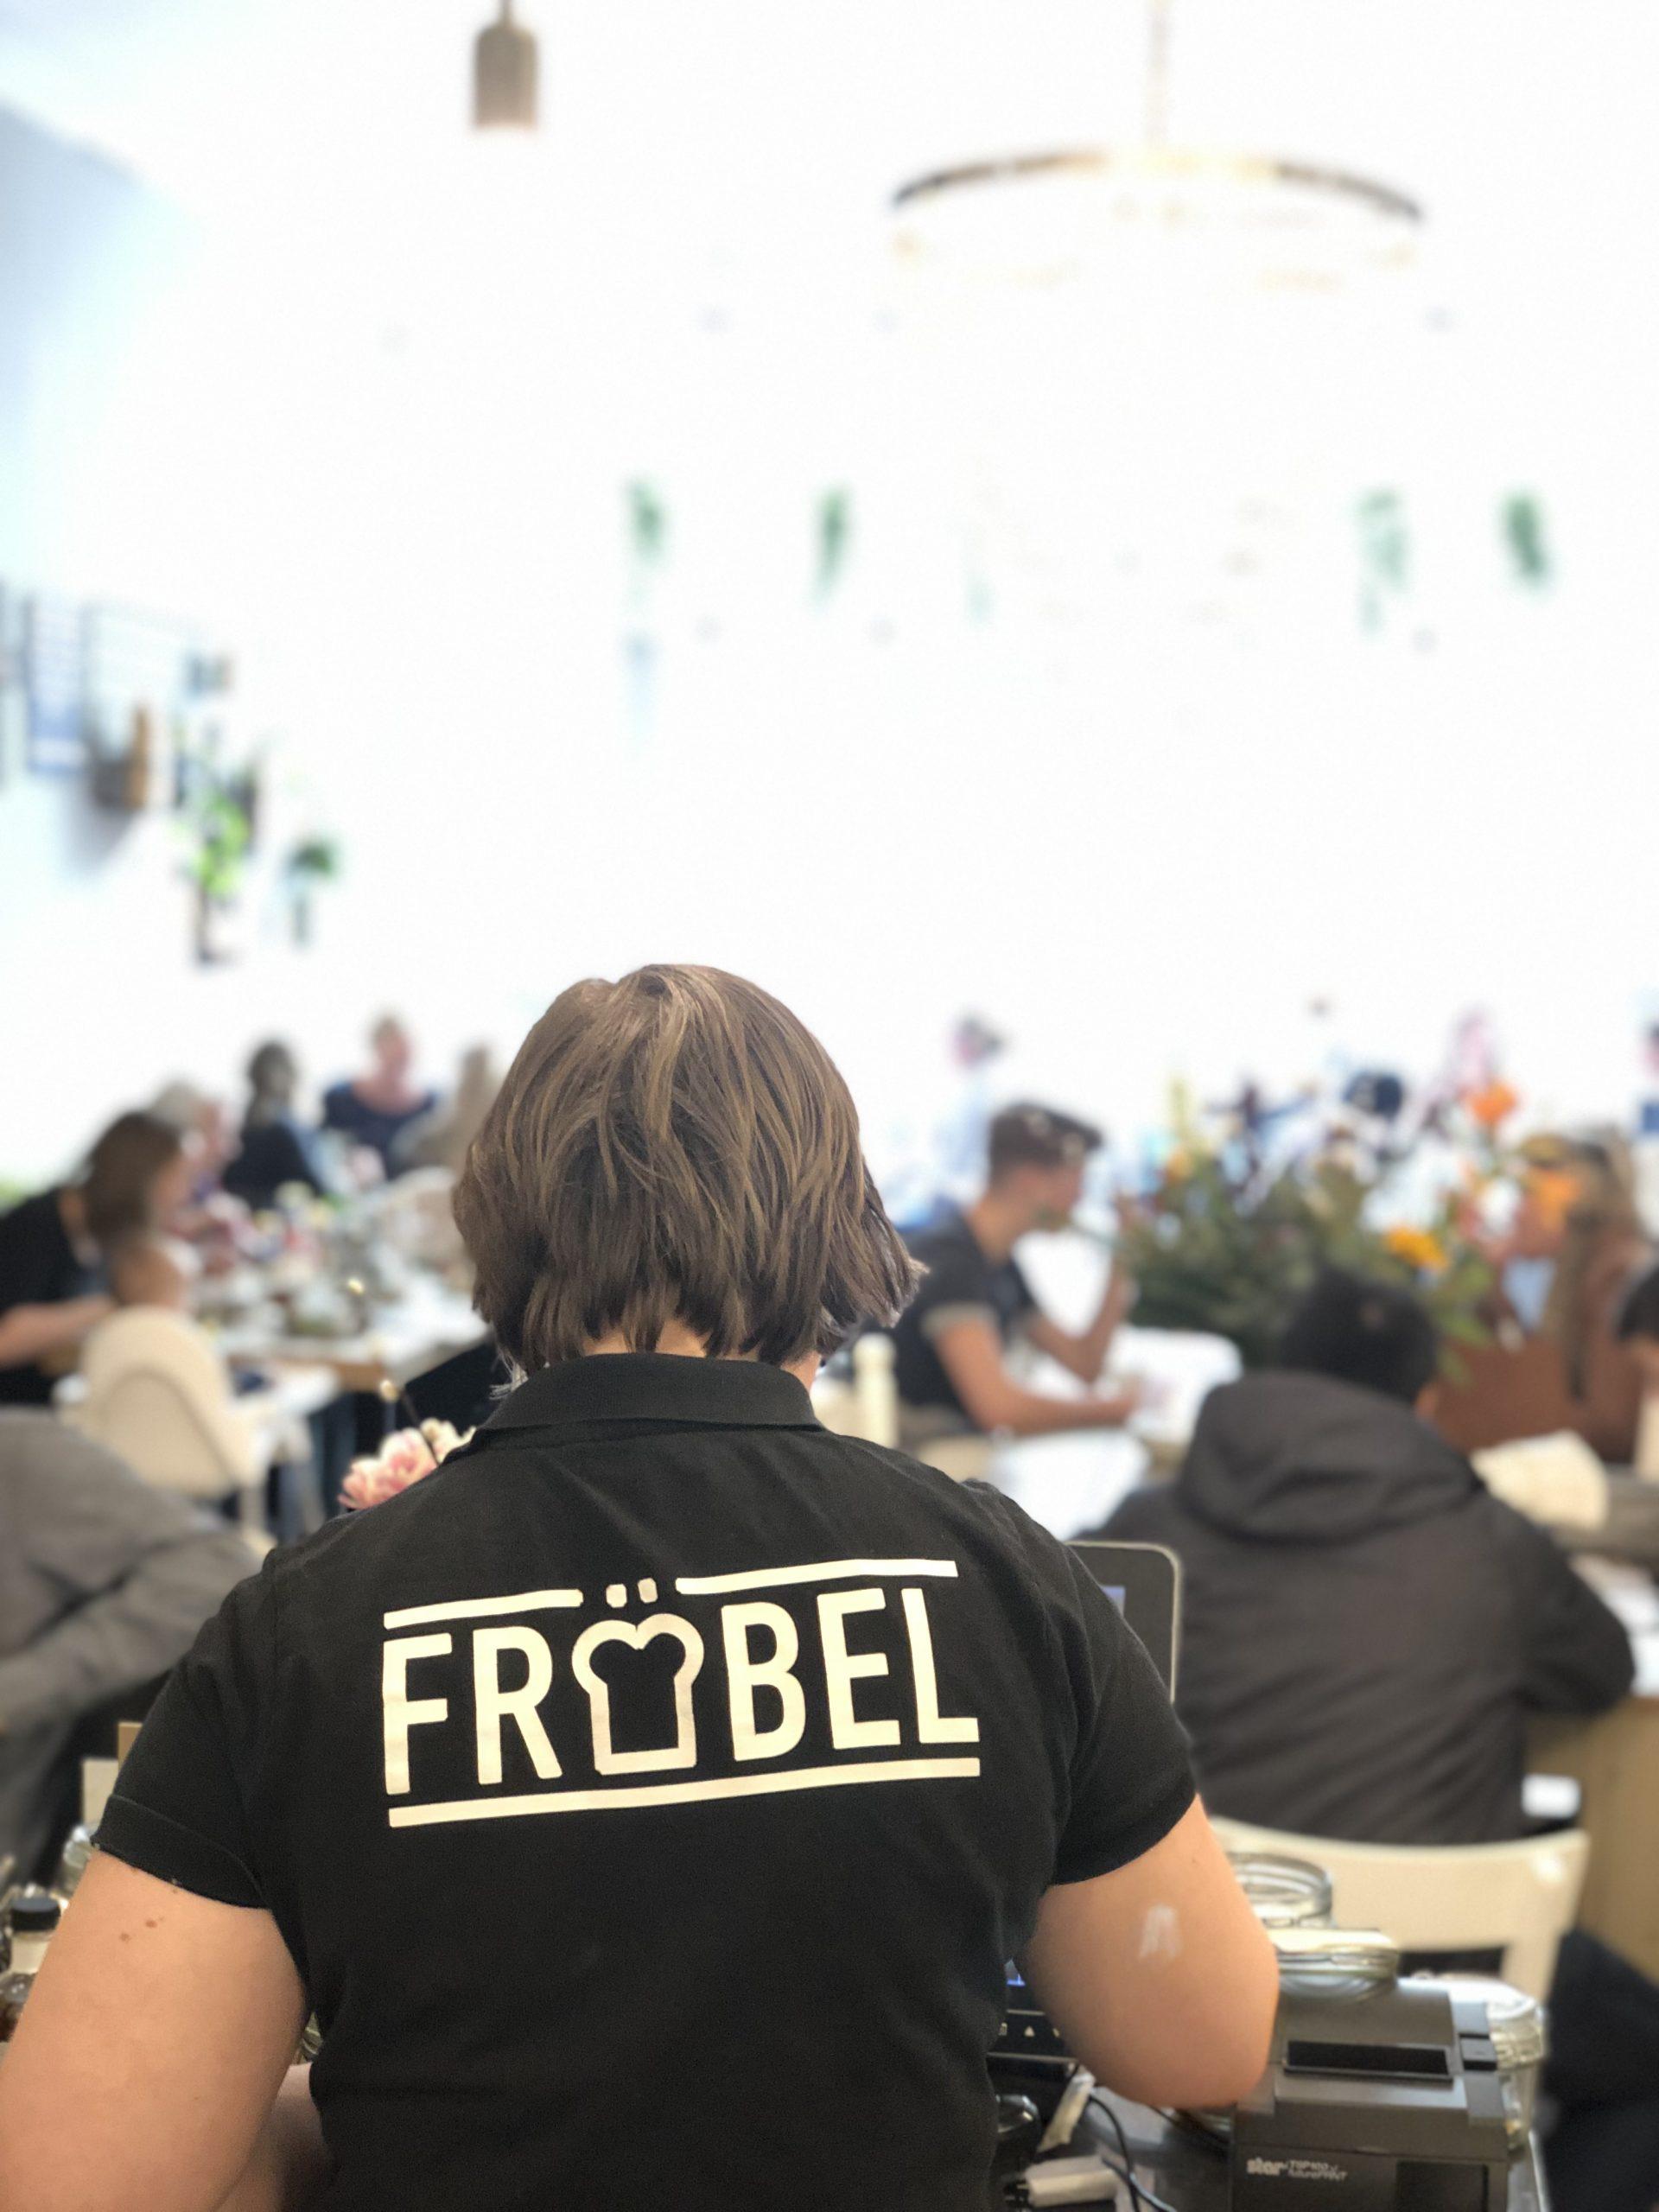 frobel-rotterdam